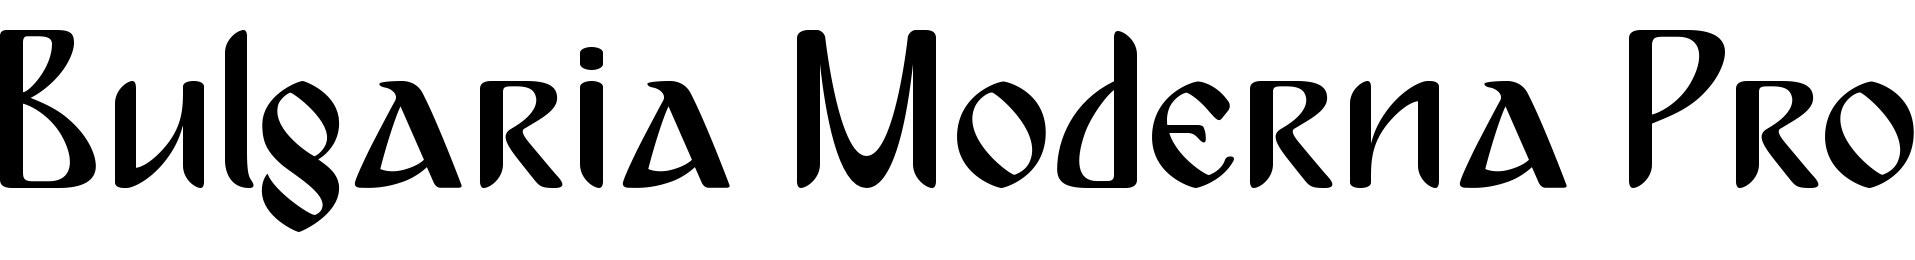 Bulgaria Moderna Pro